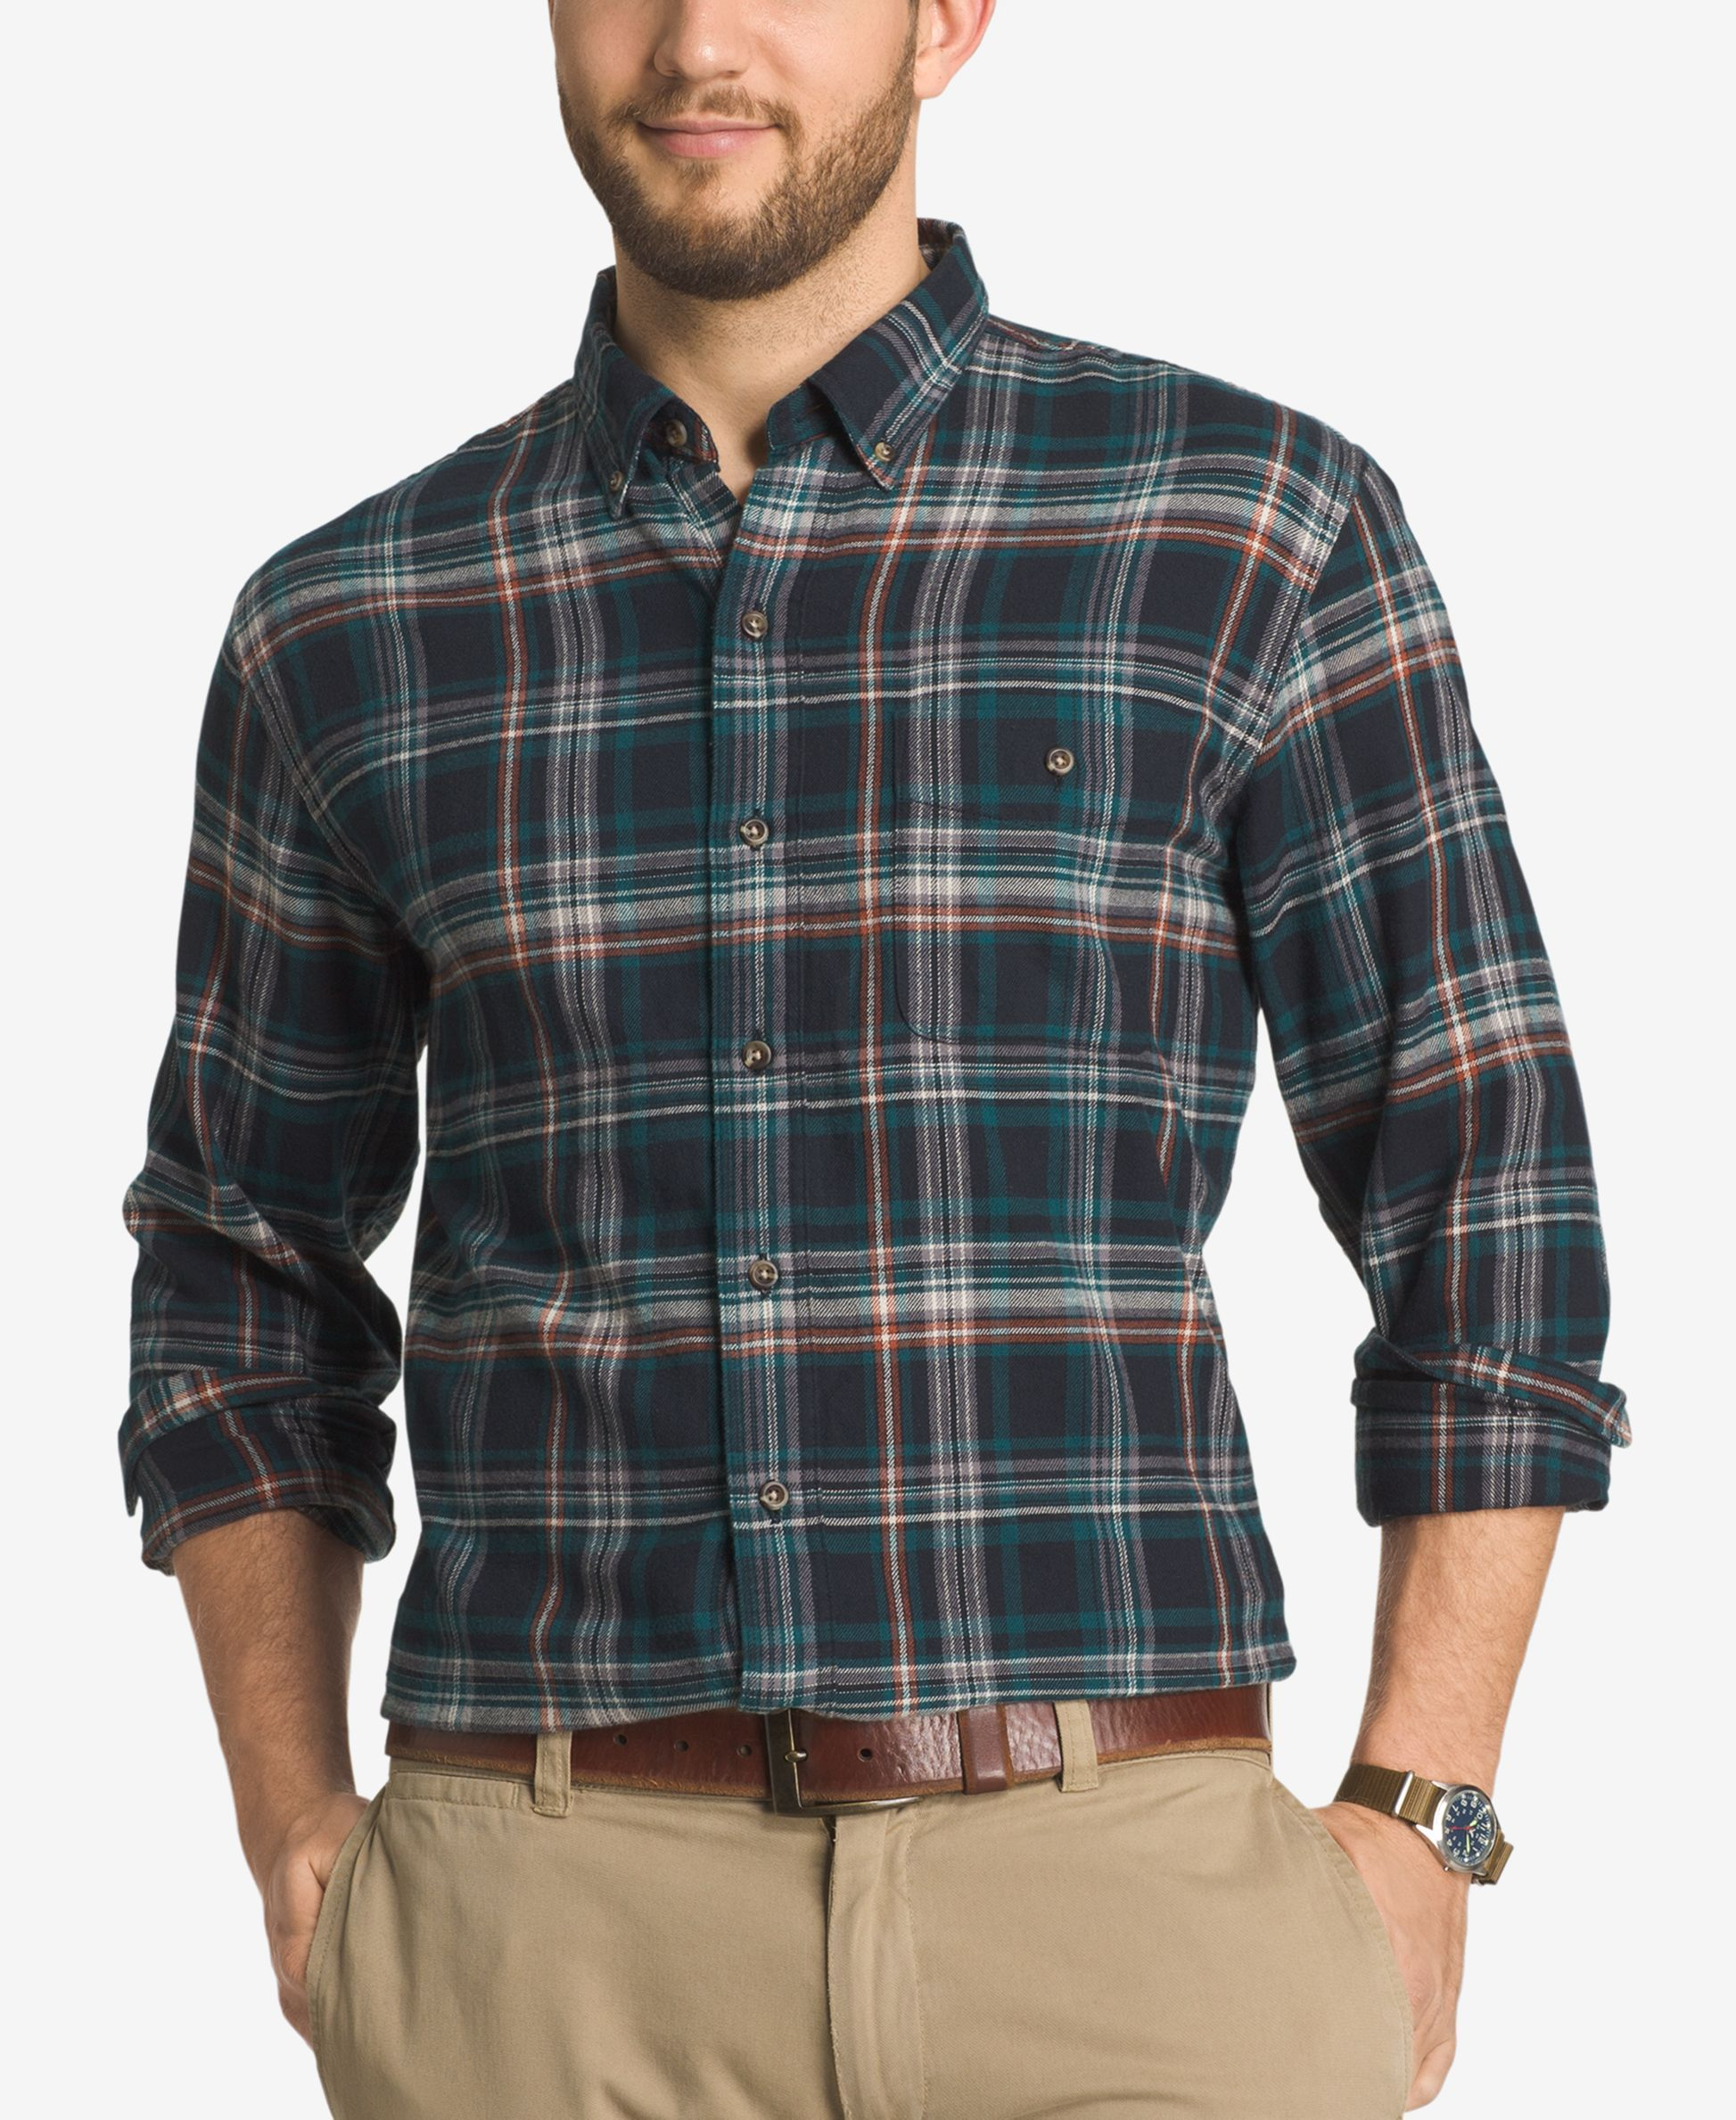 Flannel jackets with hood  Gh Bass u Co Menus Plaid Flannel LongSleeve Shirt  Products